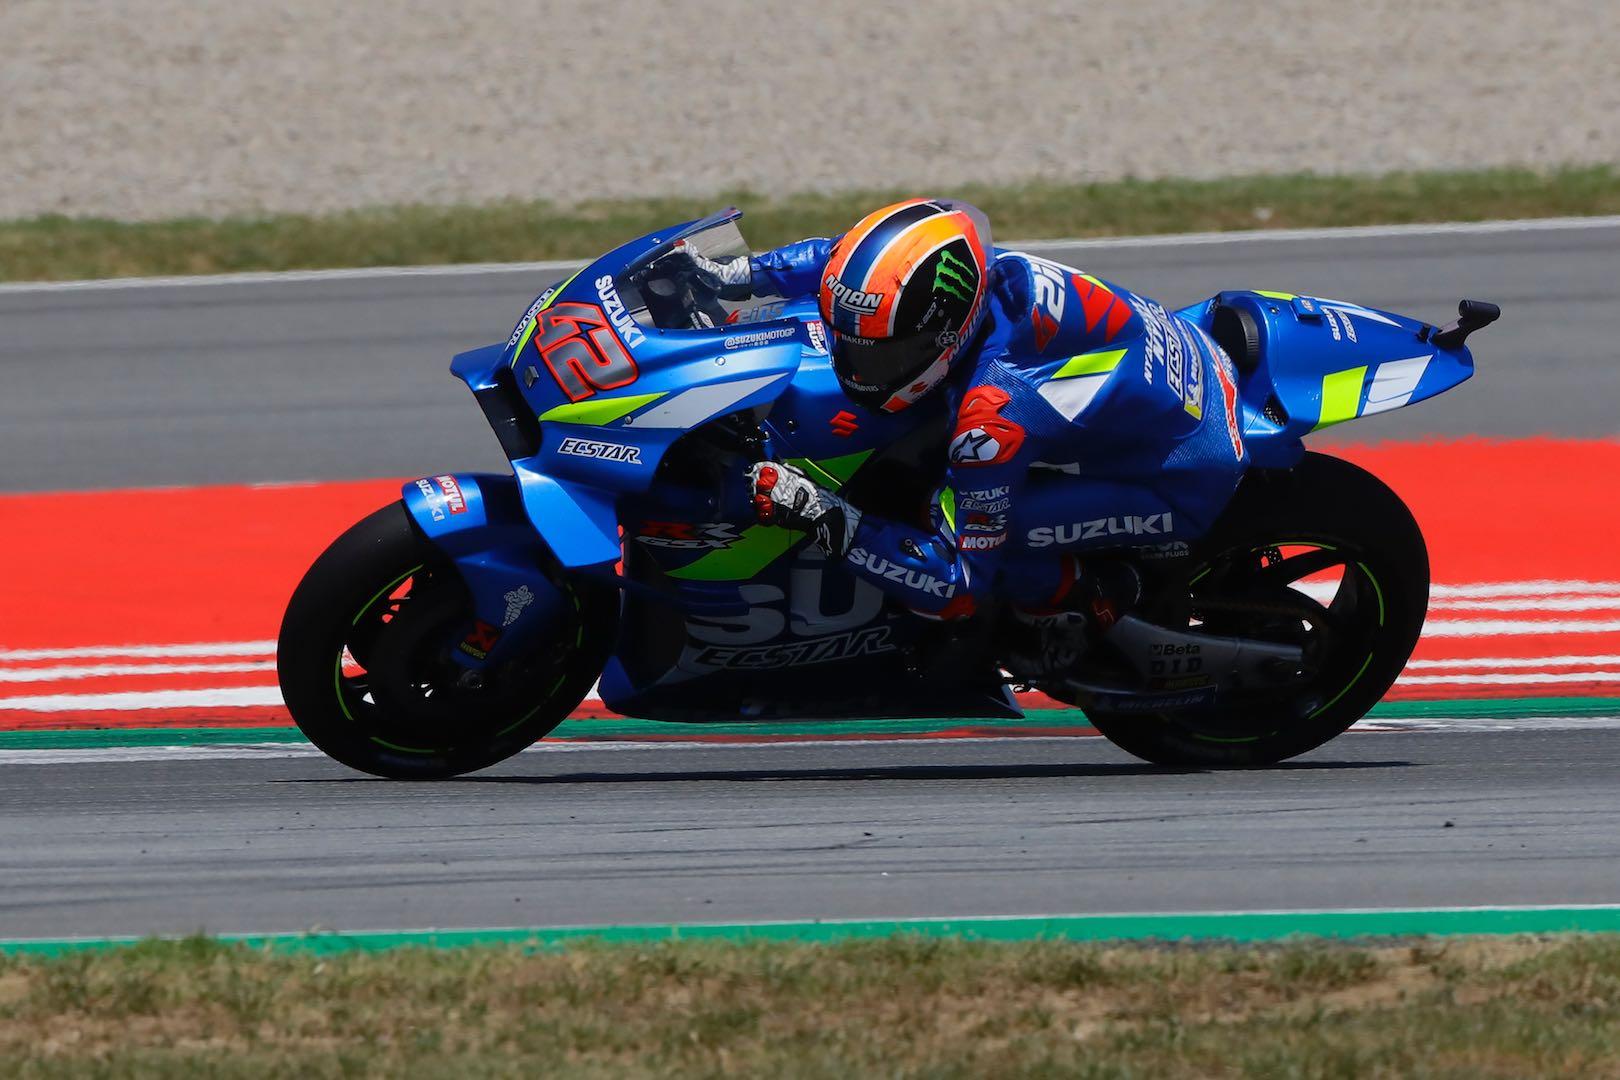 Alex Rins Suzuki's Barcelona MotoGP